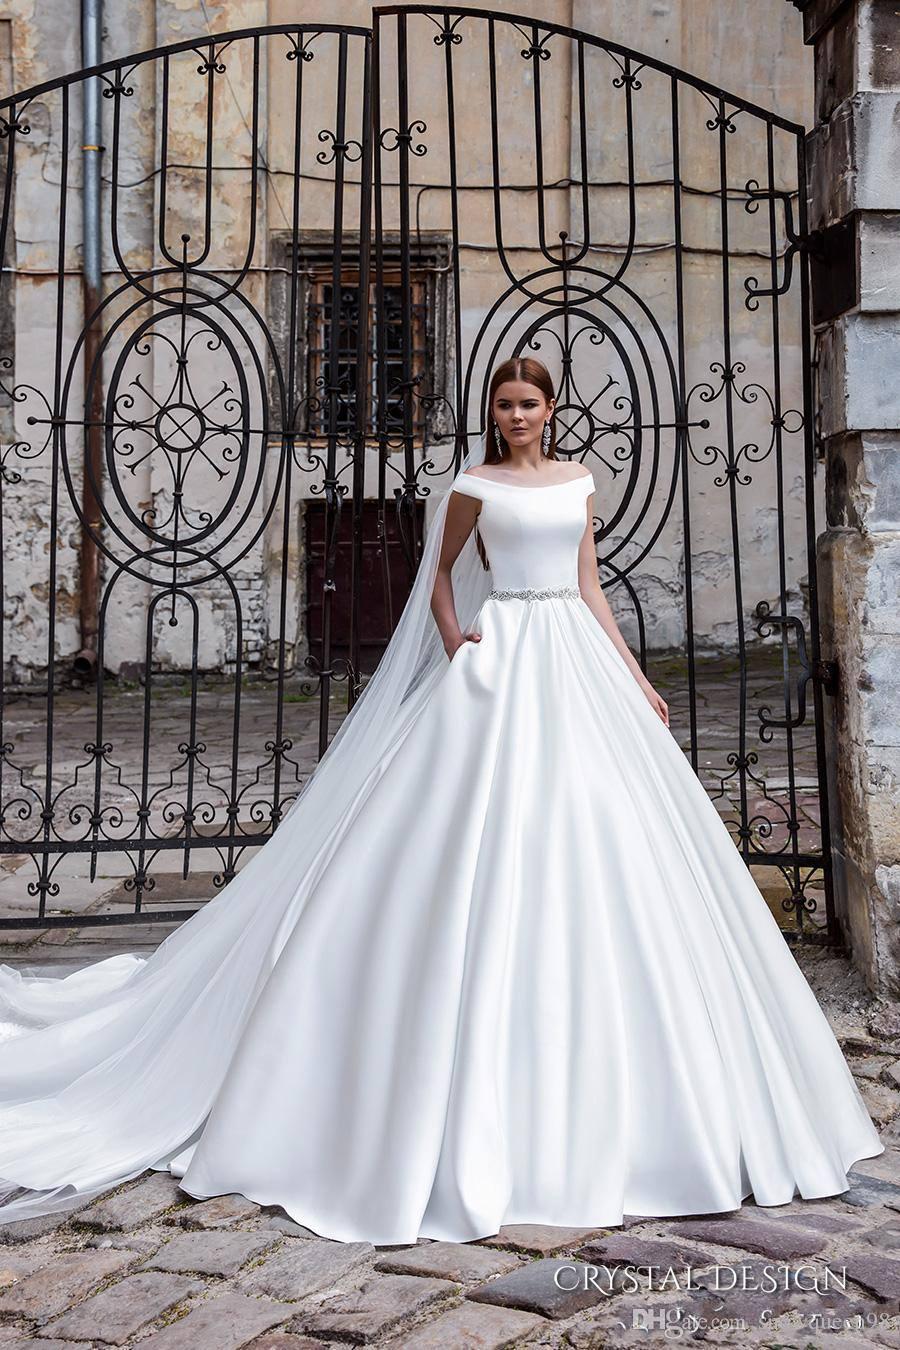 Discount New Arrival Off The Shoulder Crystal Design 2016 Wedding ...